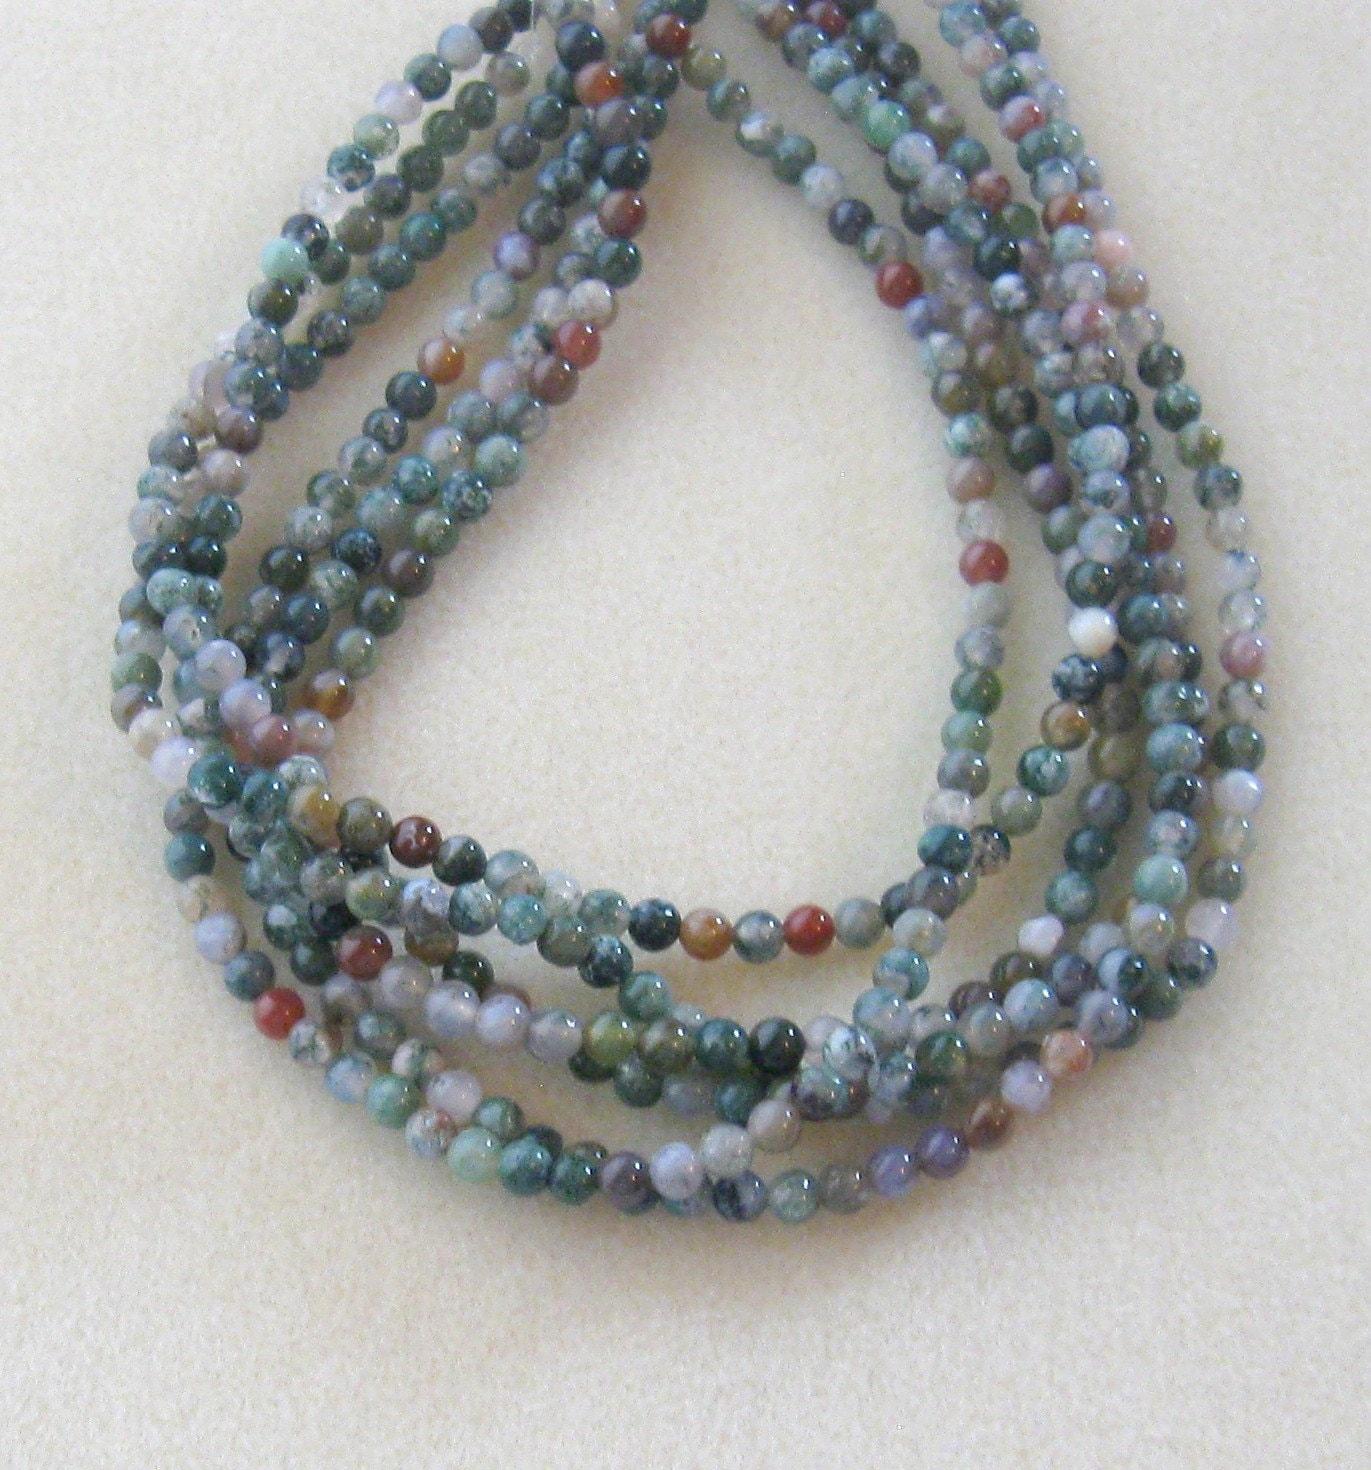 Indian agate round beads gemstone beads jewelry making for Birthstone beads for jewelry making